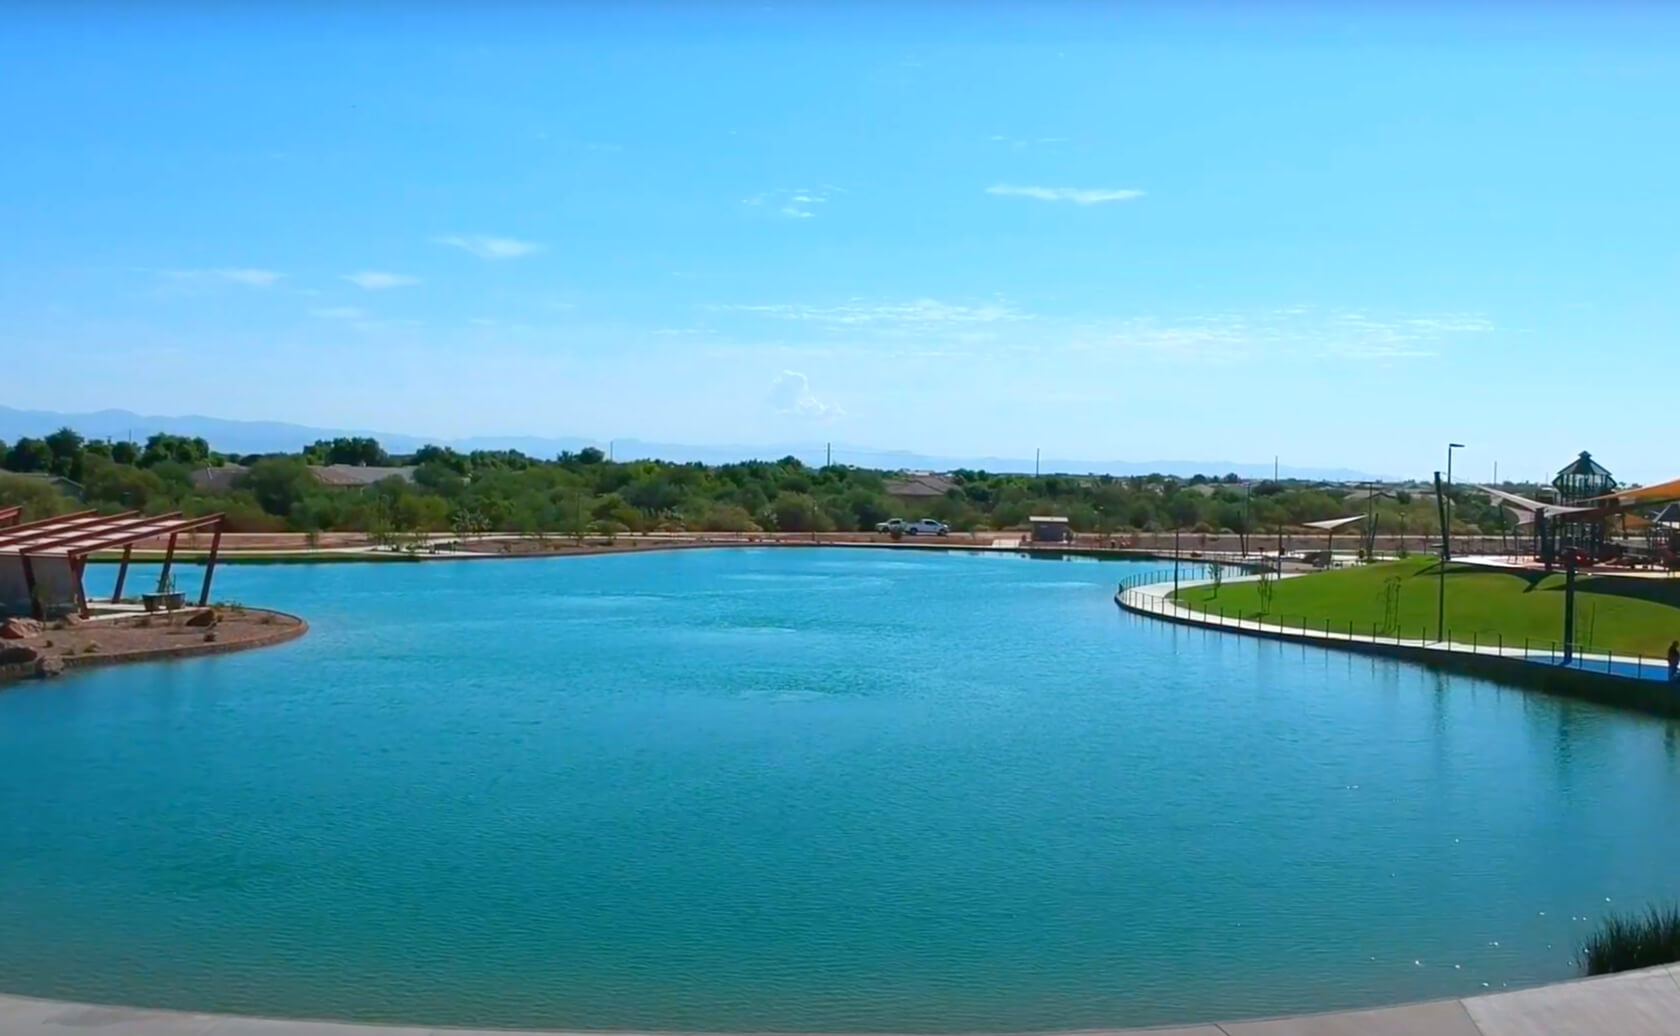 Mansel-Carter-Oasis-Lake-fishing-guide-report-queen-creek-az-031